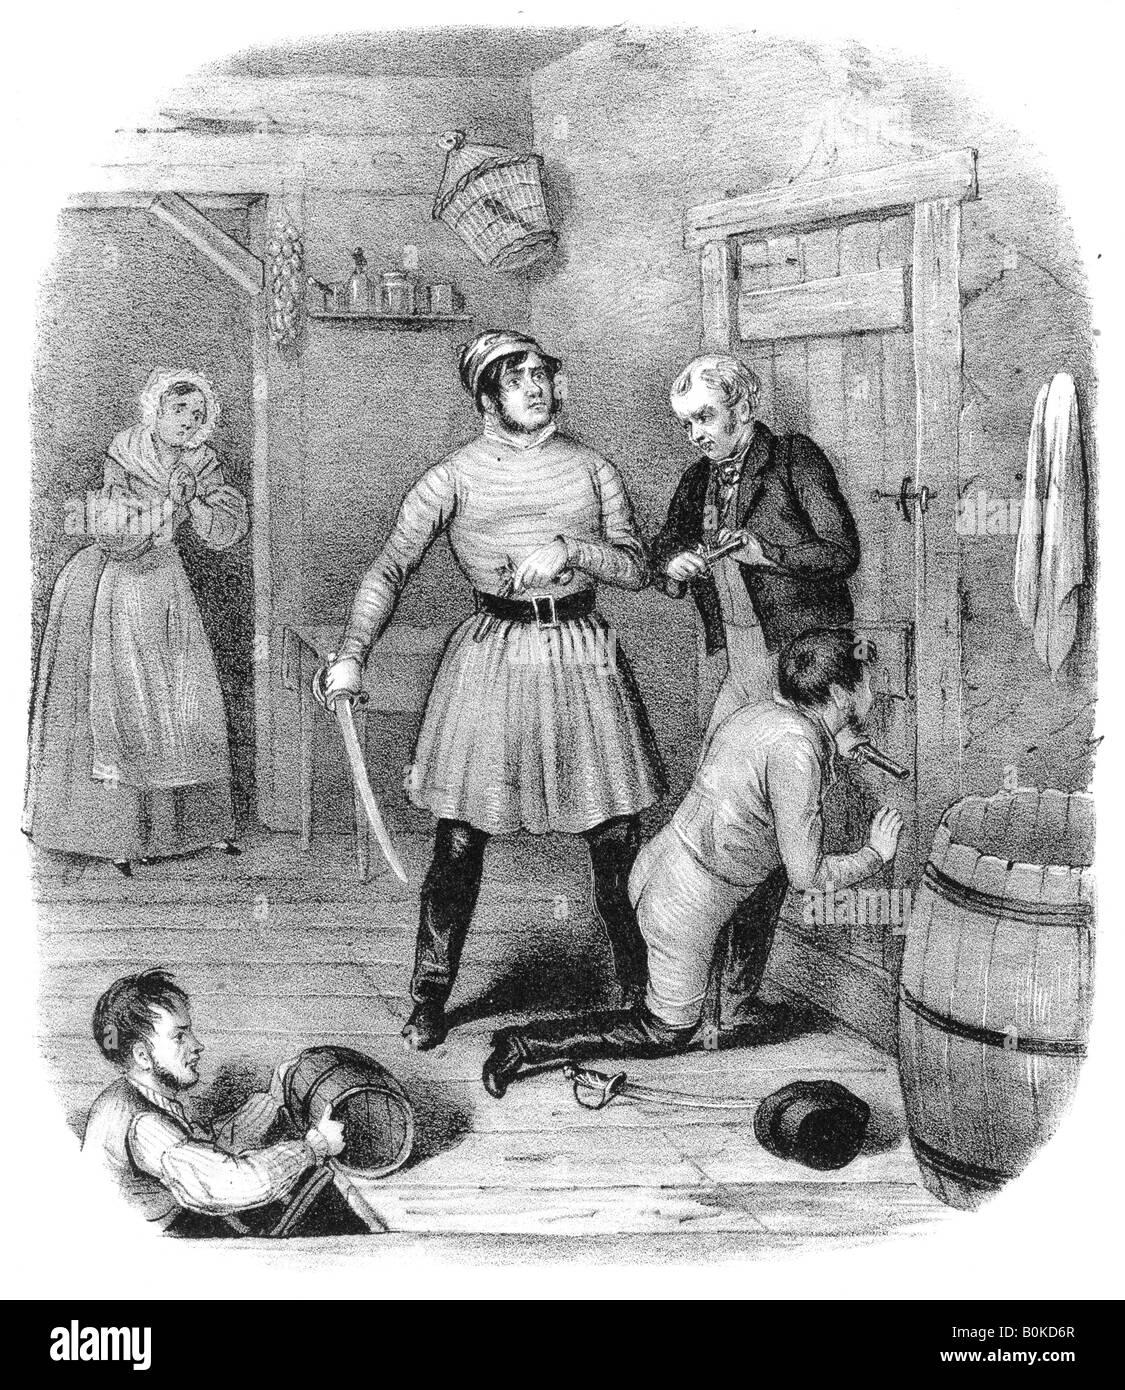 'Smugglers Alarmed', 18th century. Artist: W Clerk - Stock Image